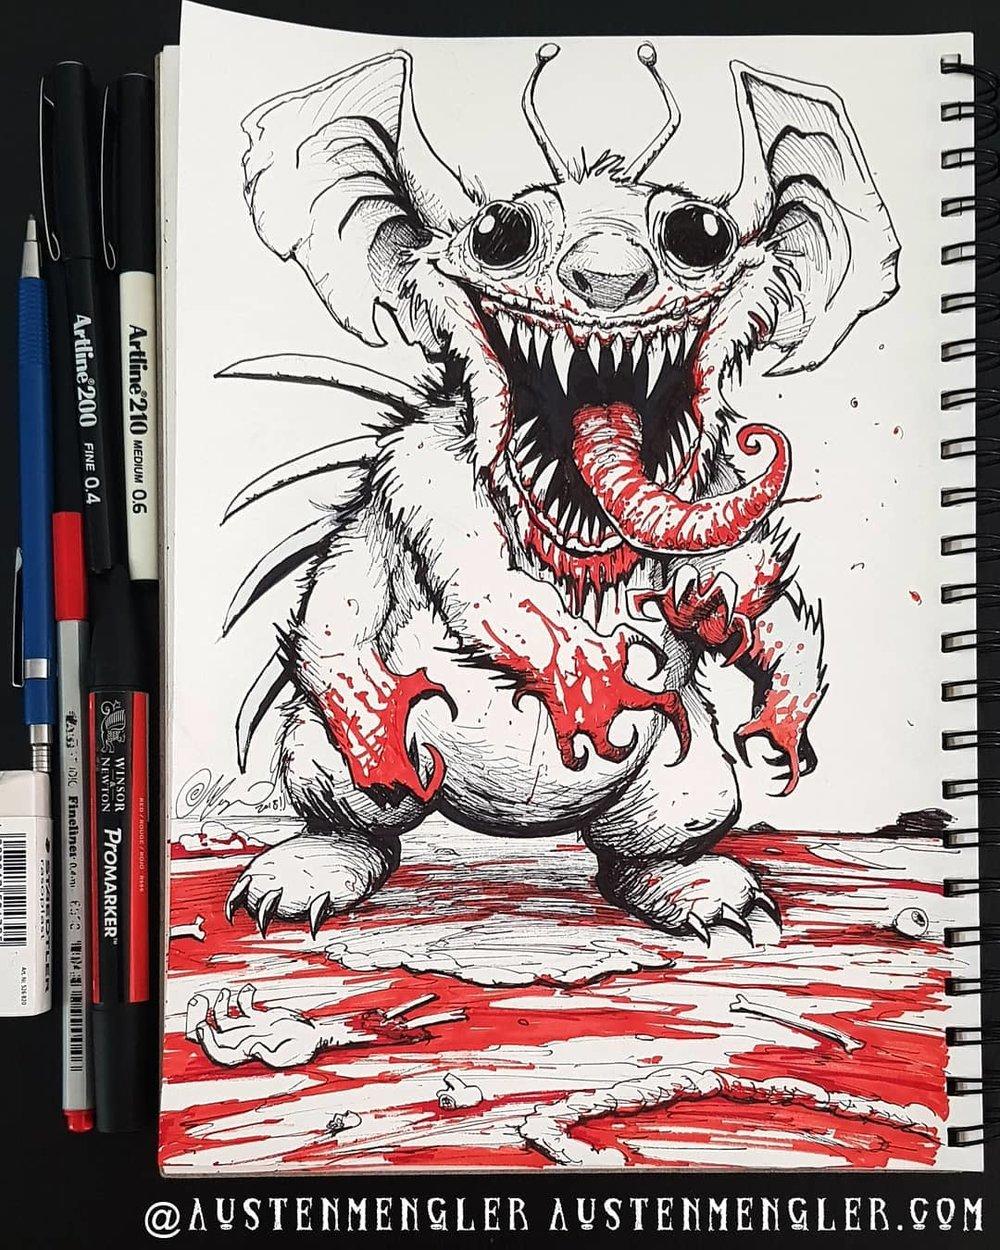 Day 09 - Stitch